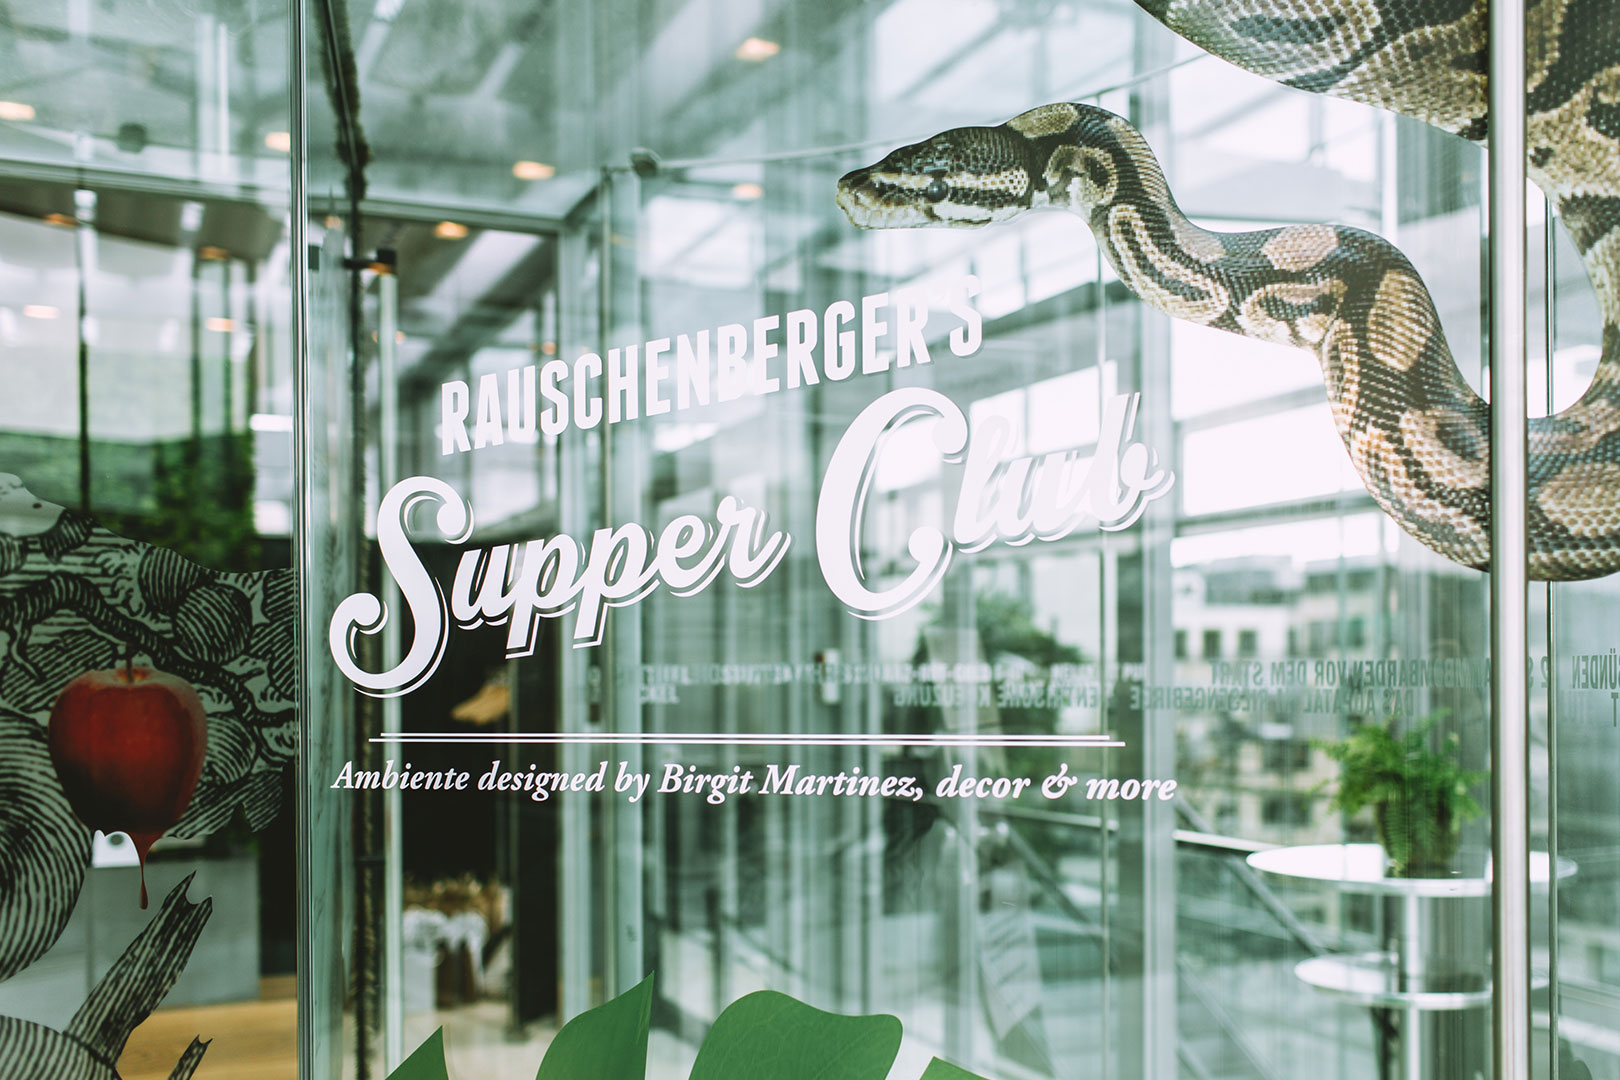 Rauschenbergers Supper Club